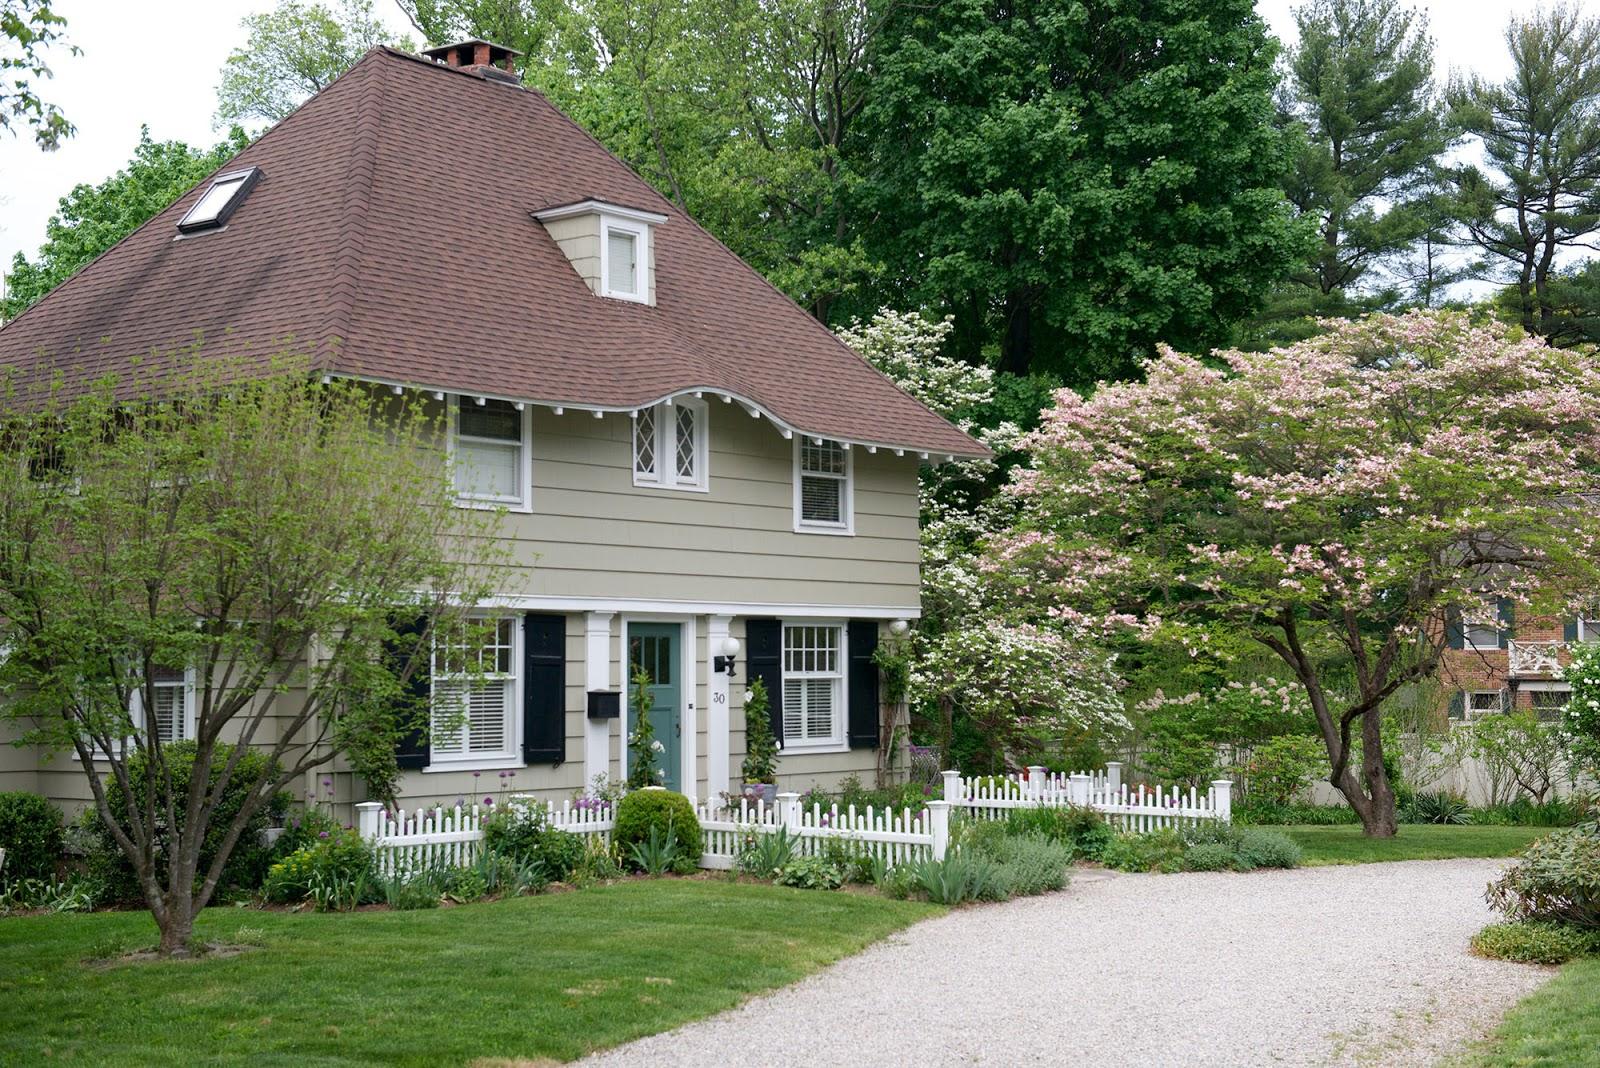 Cottage Style Shelters : Shelter cottage love